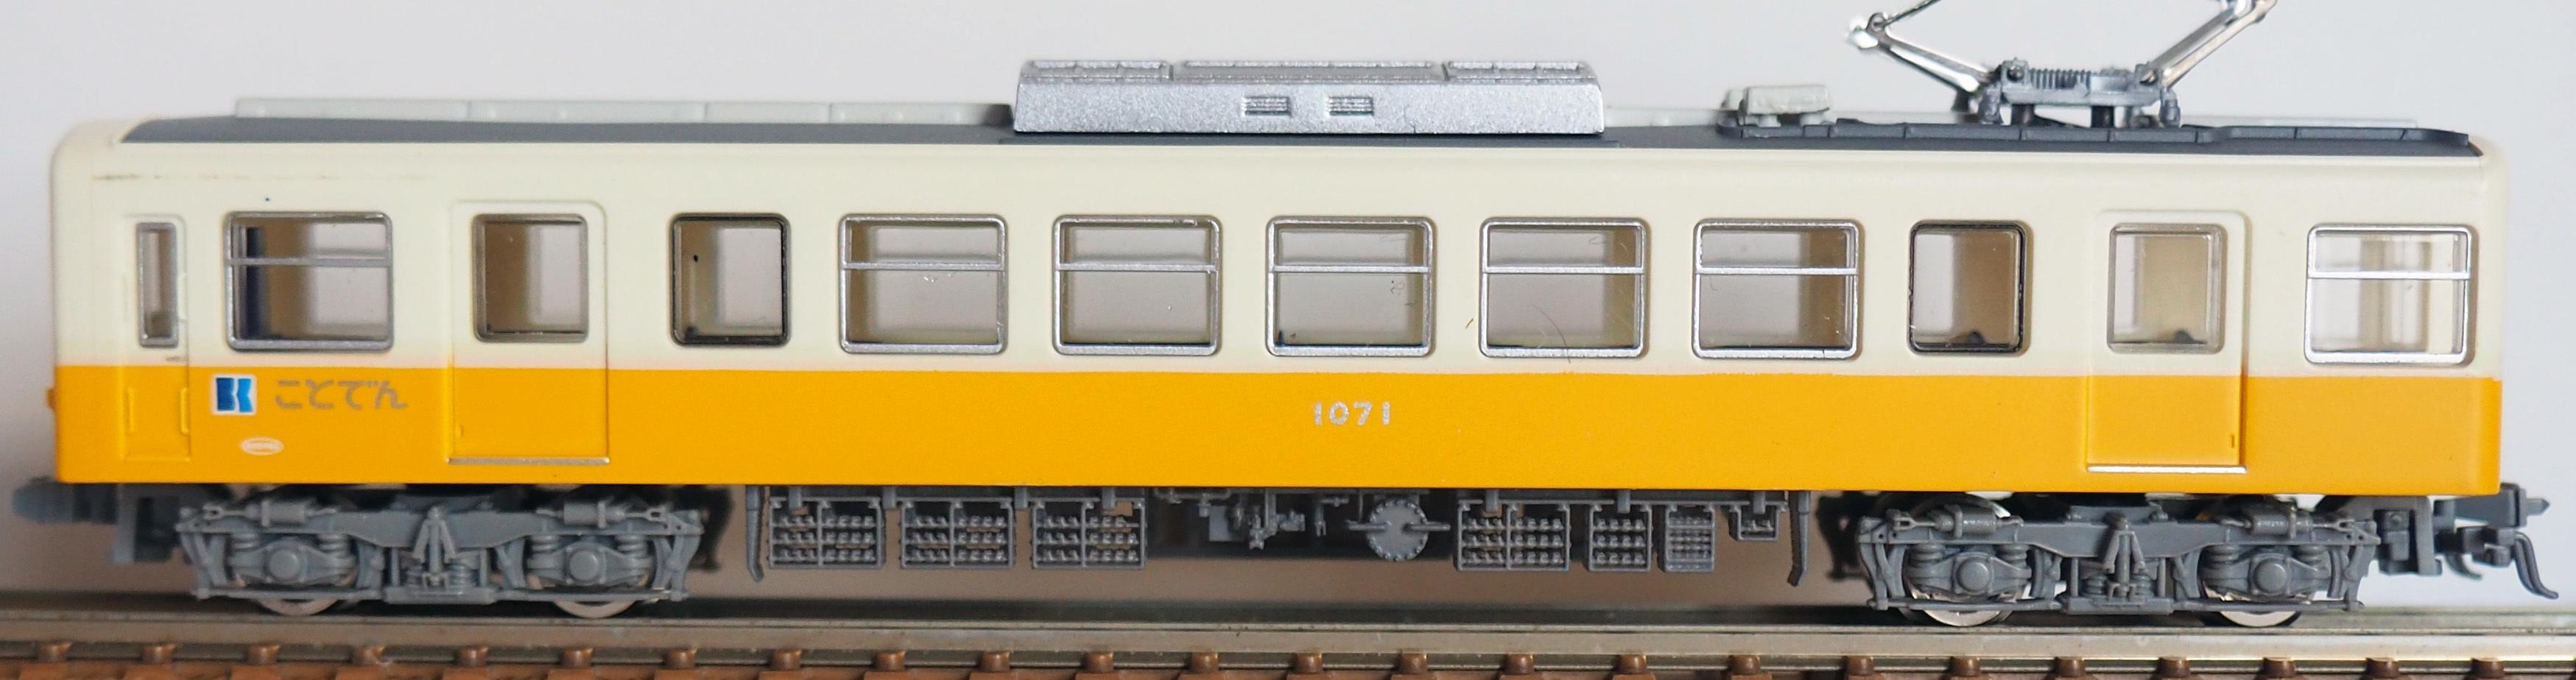 P2123160.jpg